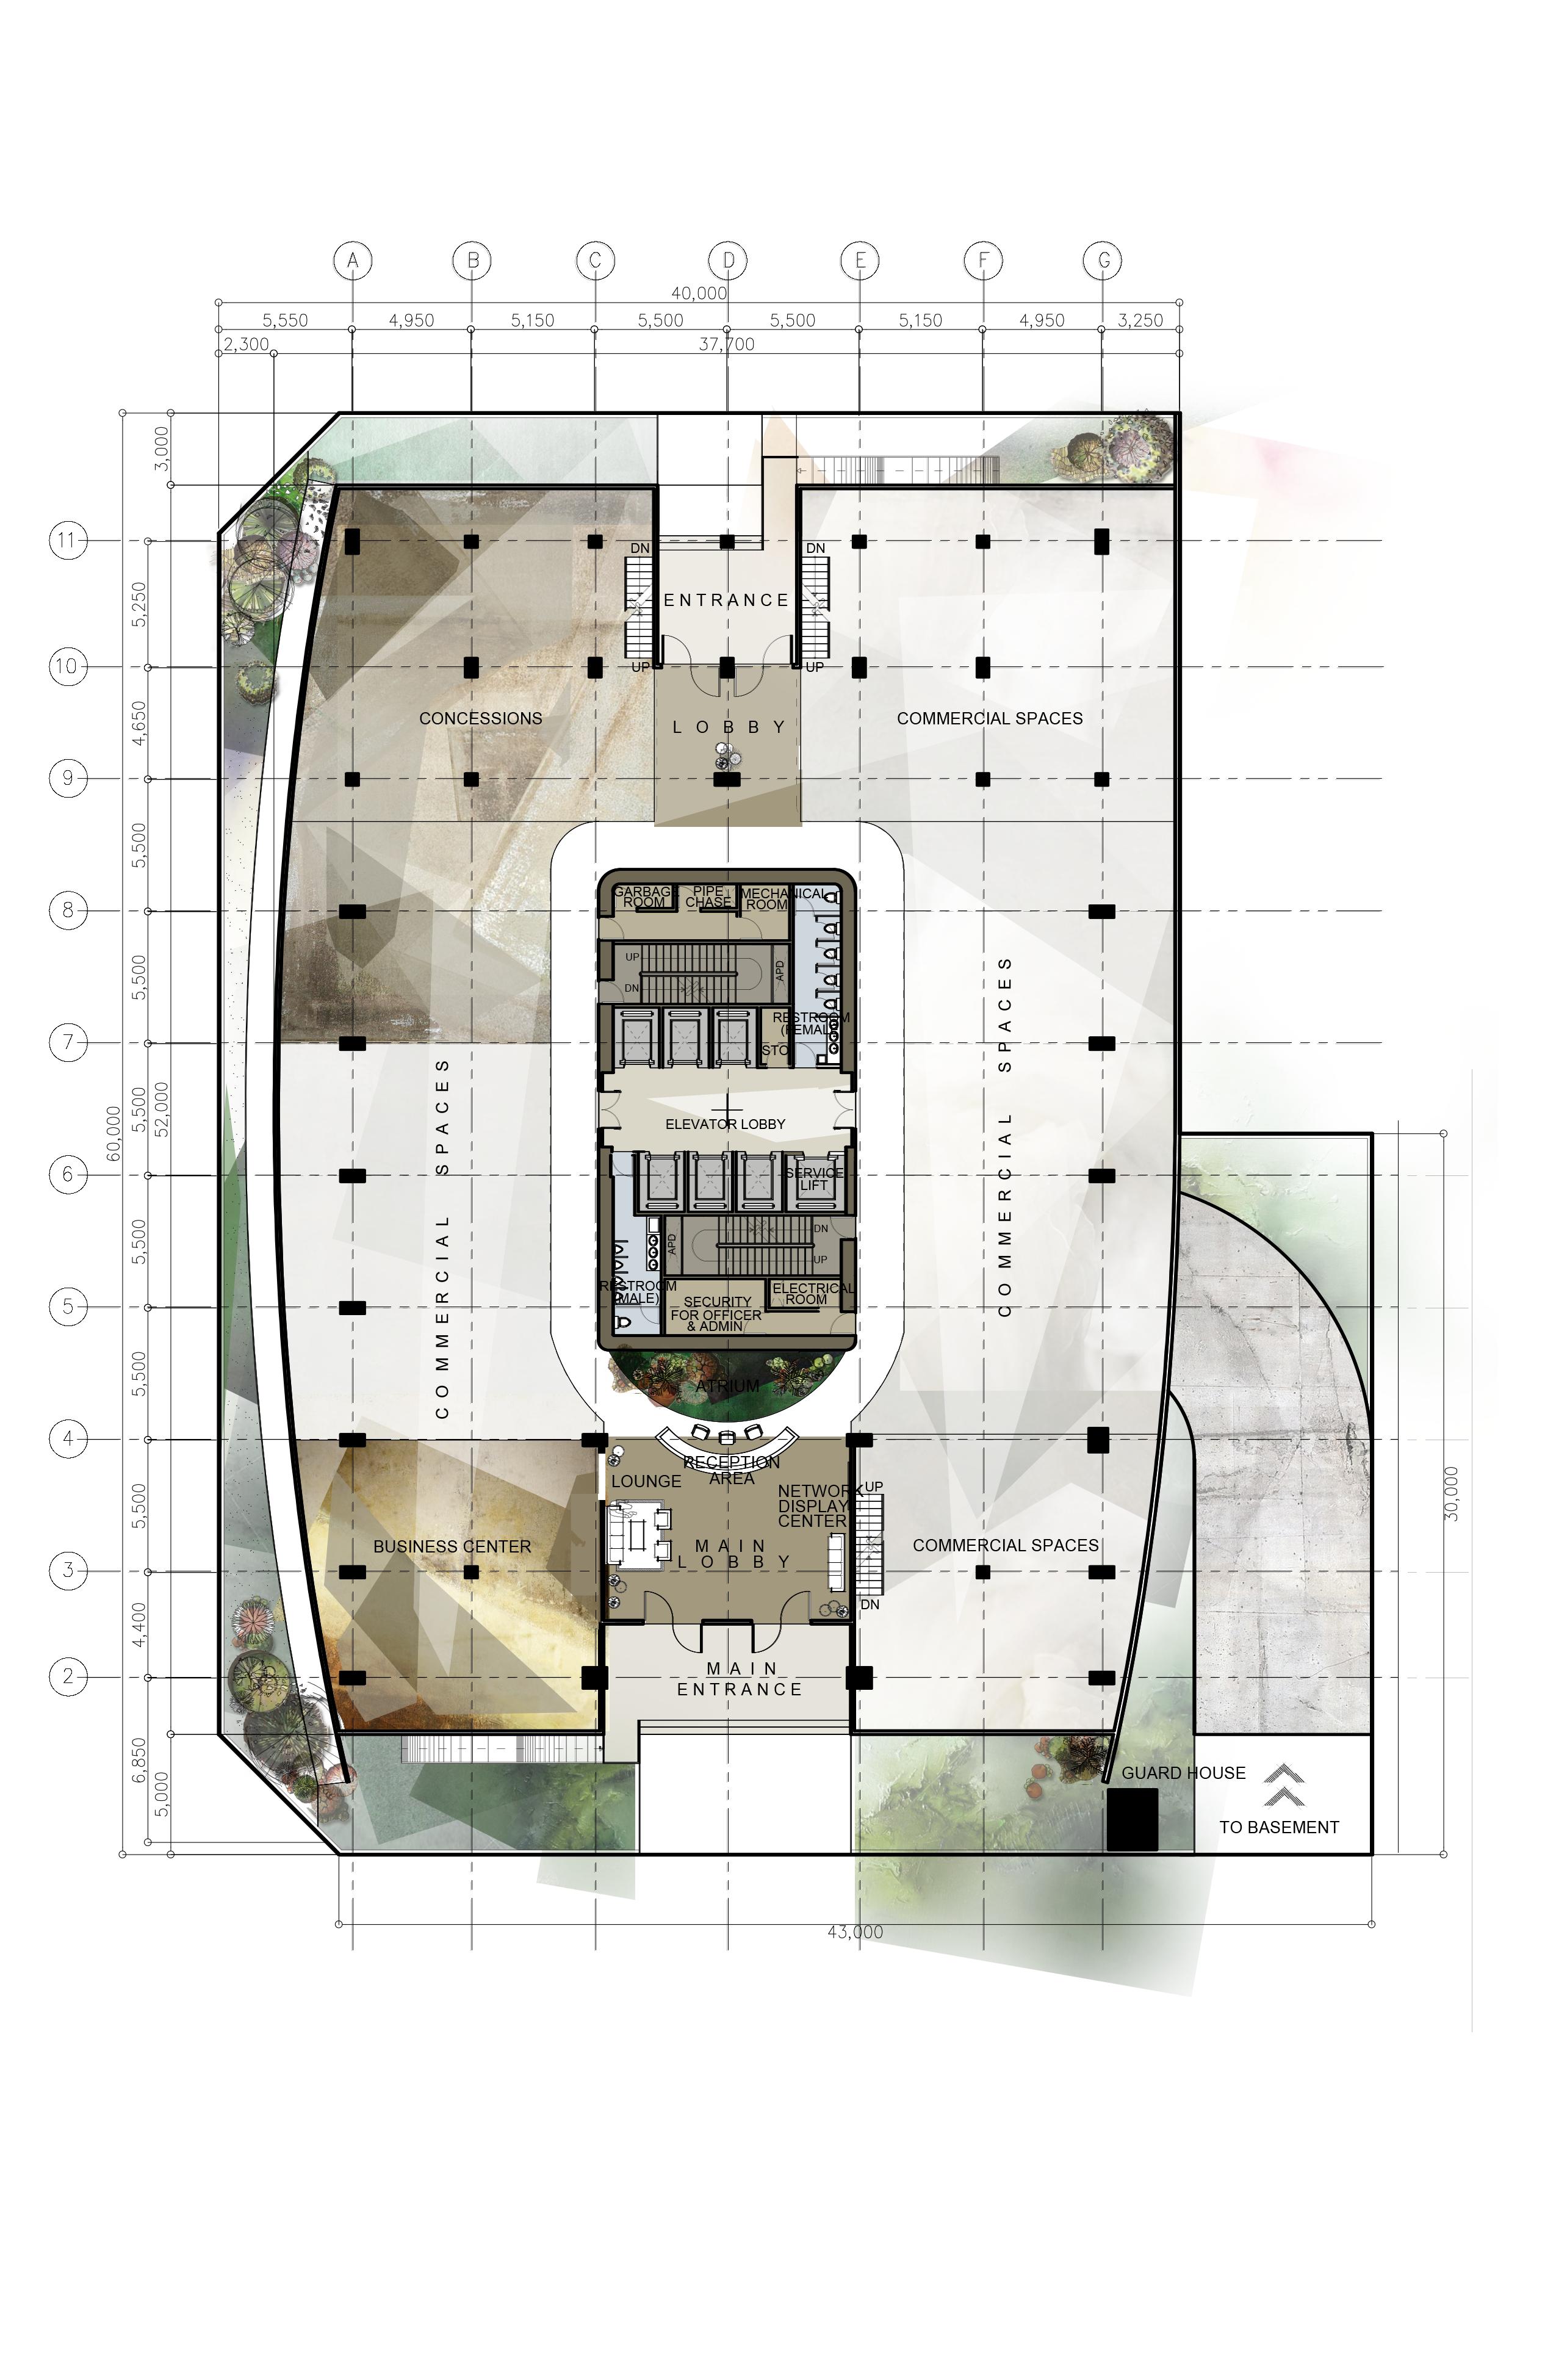 Design 8 Proposed Corporate Office Building High Rise Building Architectural Layouts Floor Plans Plates Arsitektur Modern Denah Rumah Arsitek